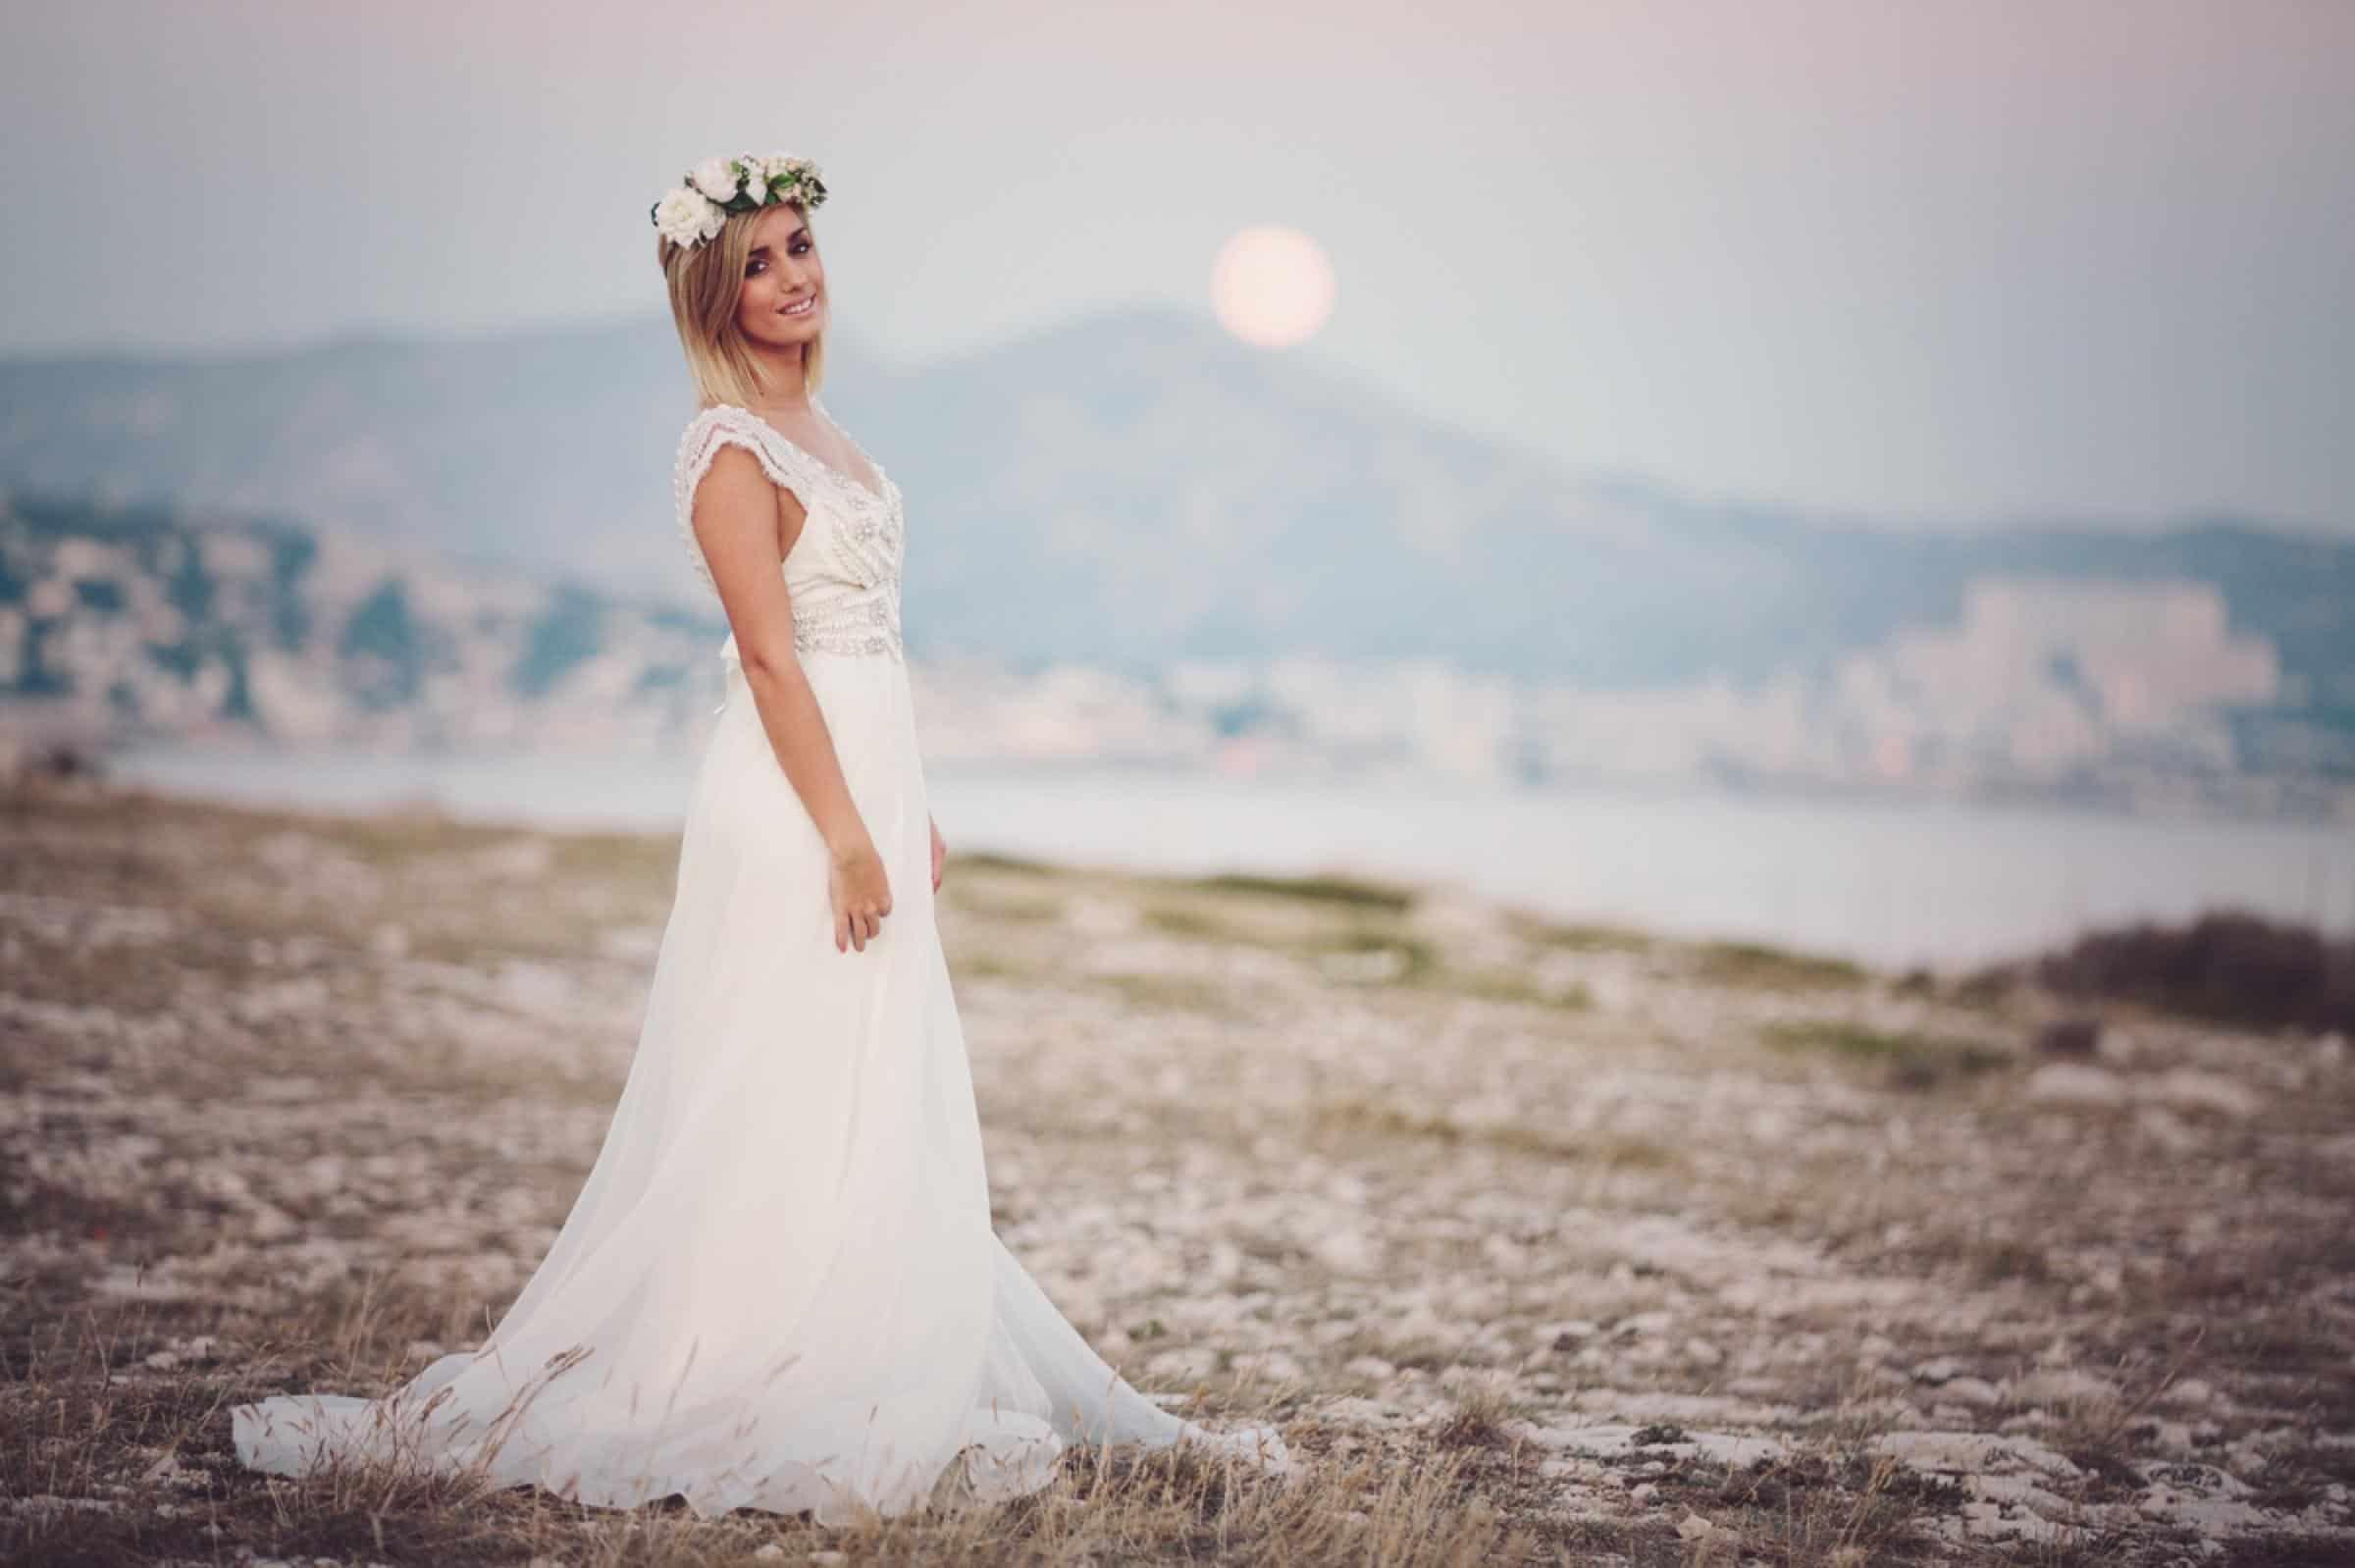 Marseille France Wedding Photographer Anna Campbell Design Mint + melon Flower crown www.benandhopeweddings.com.au